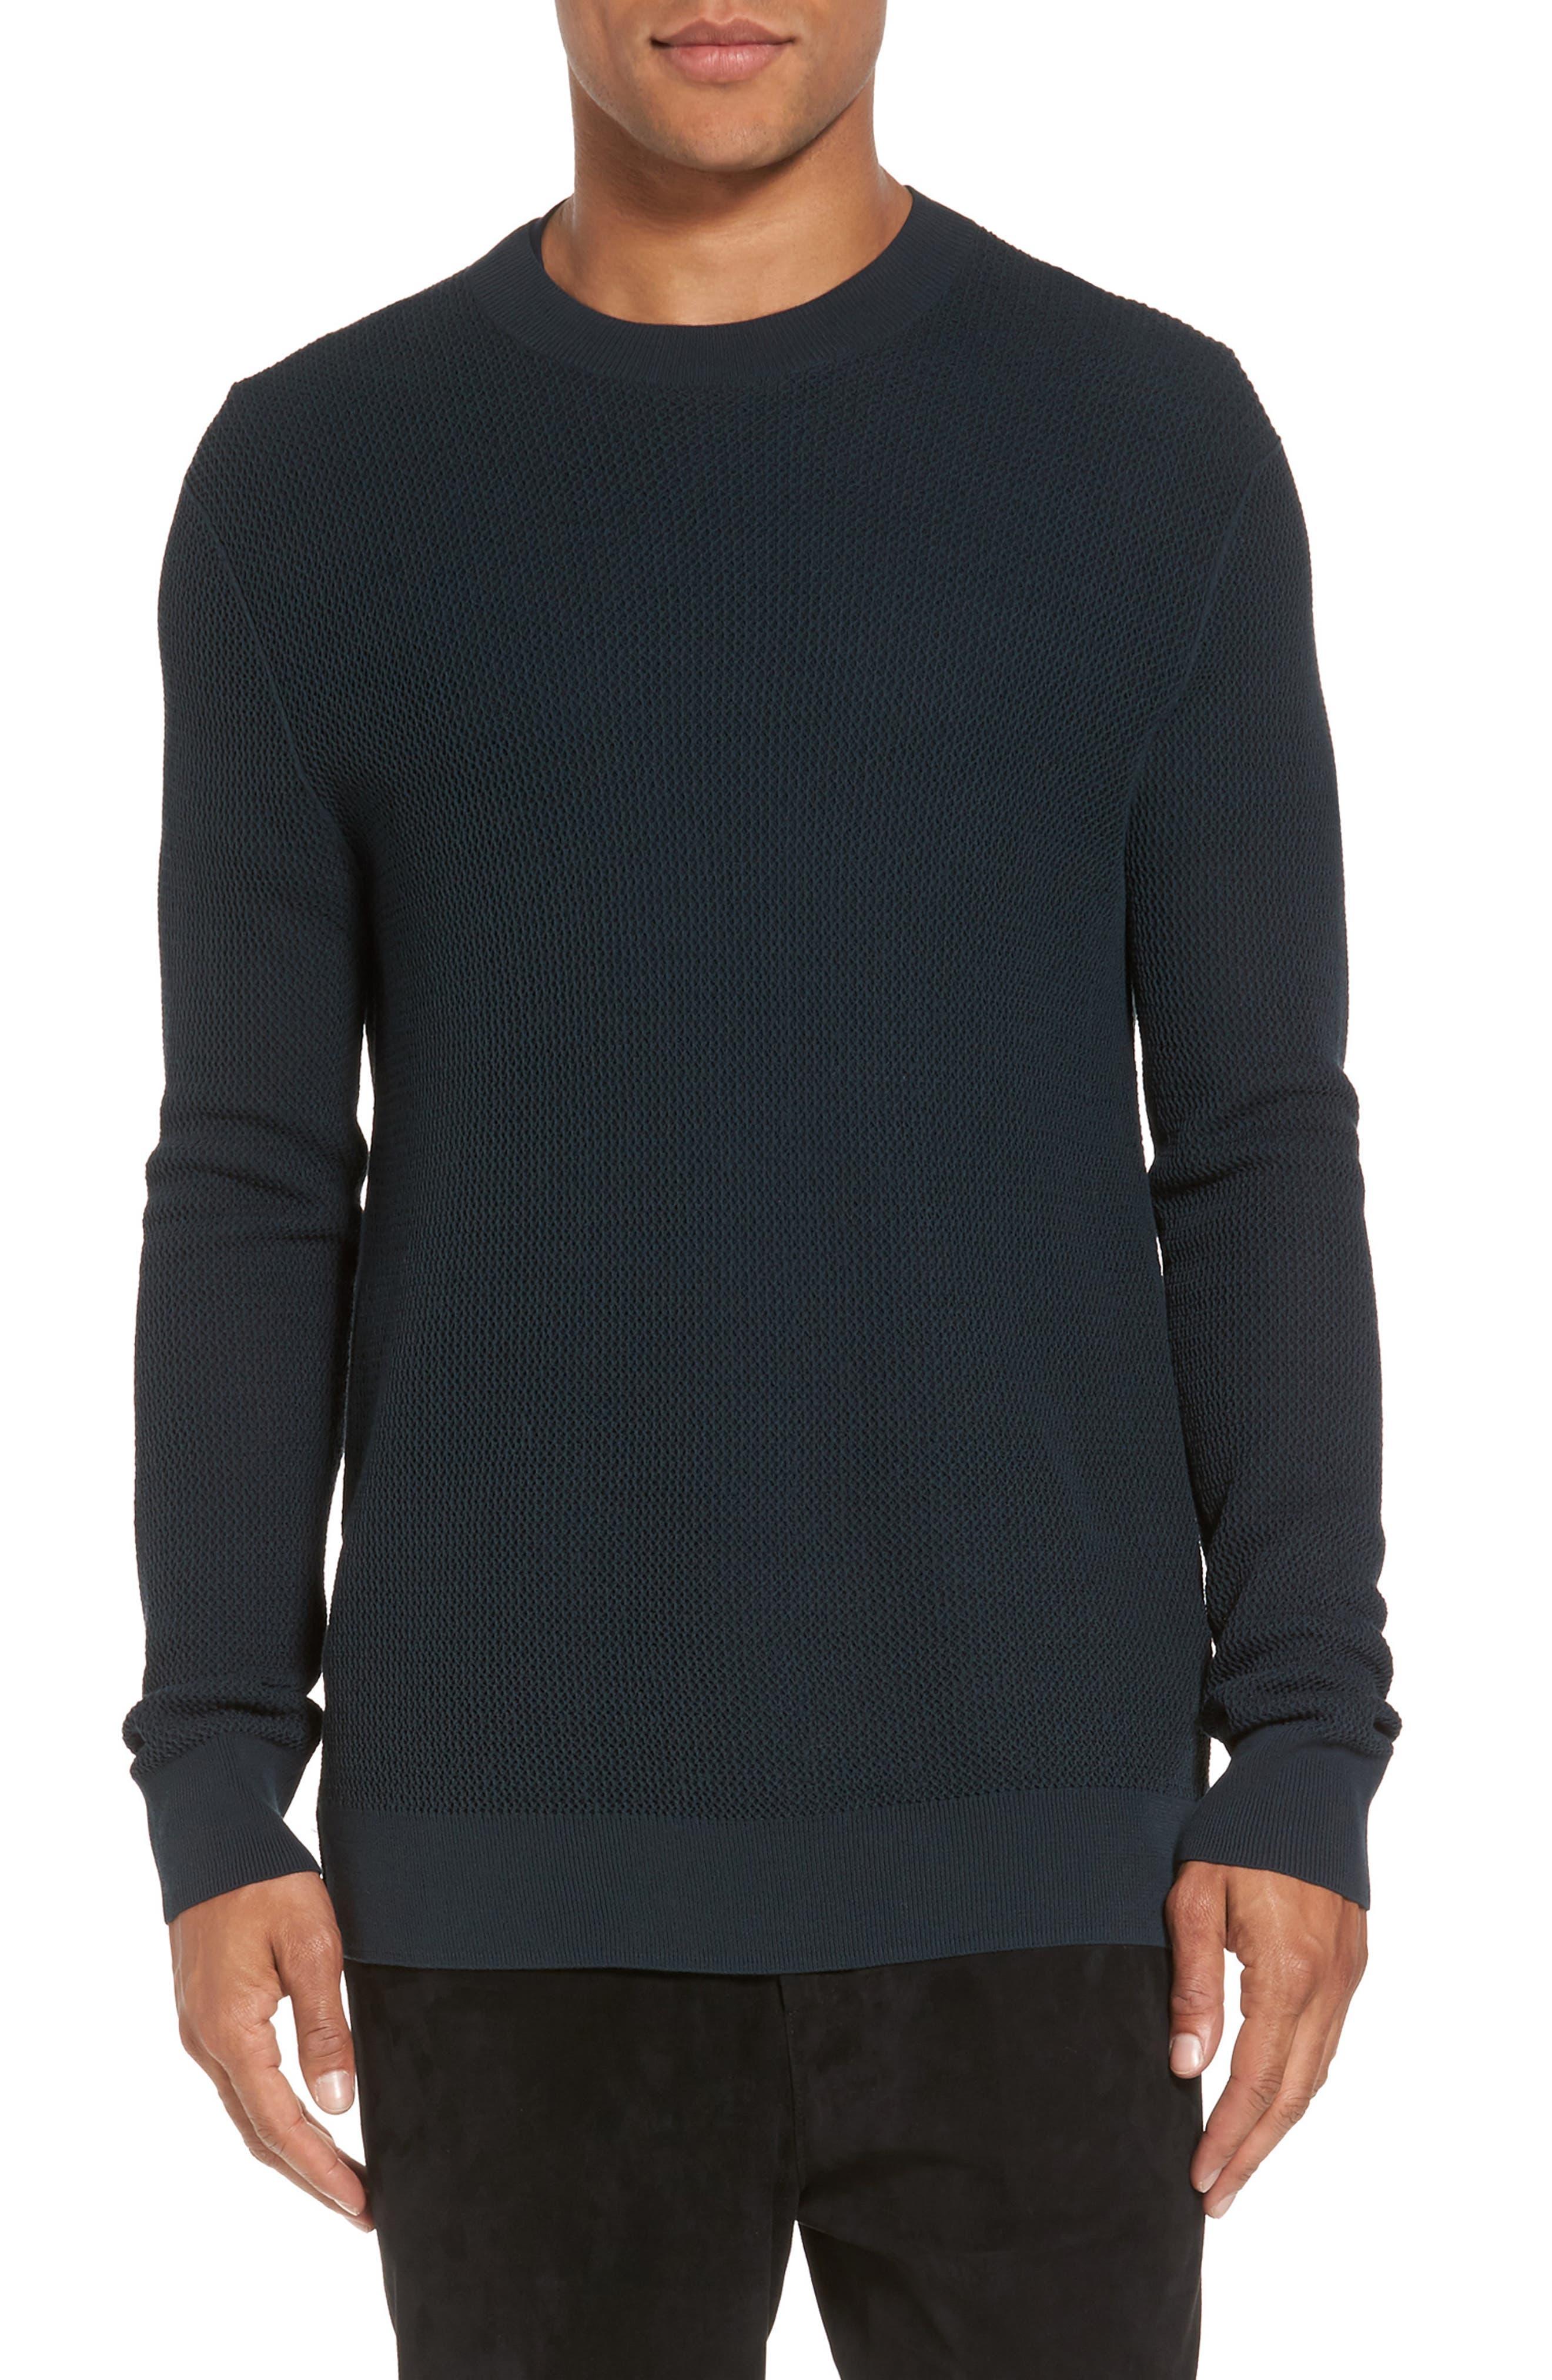 Vince Mesh Crewneck Sweater